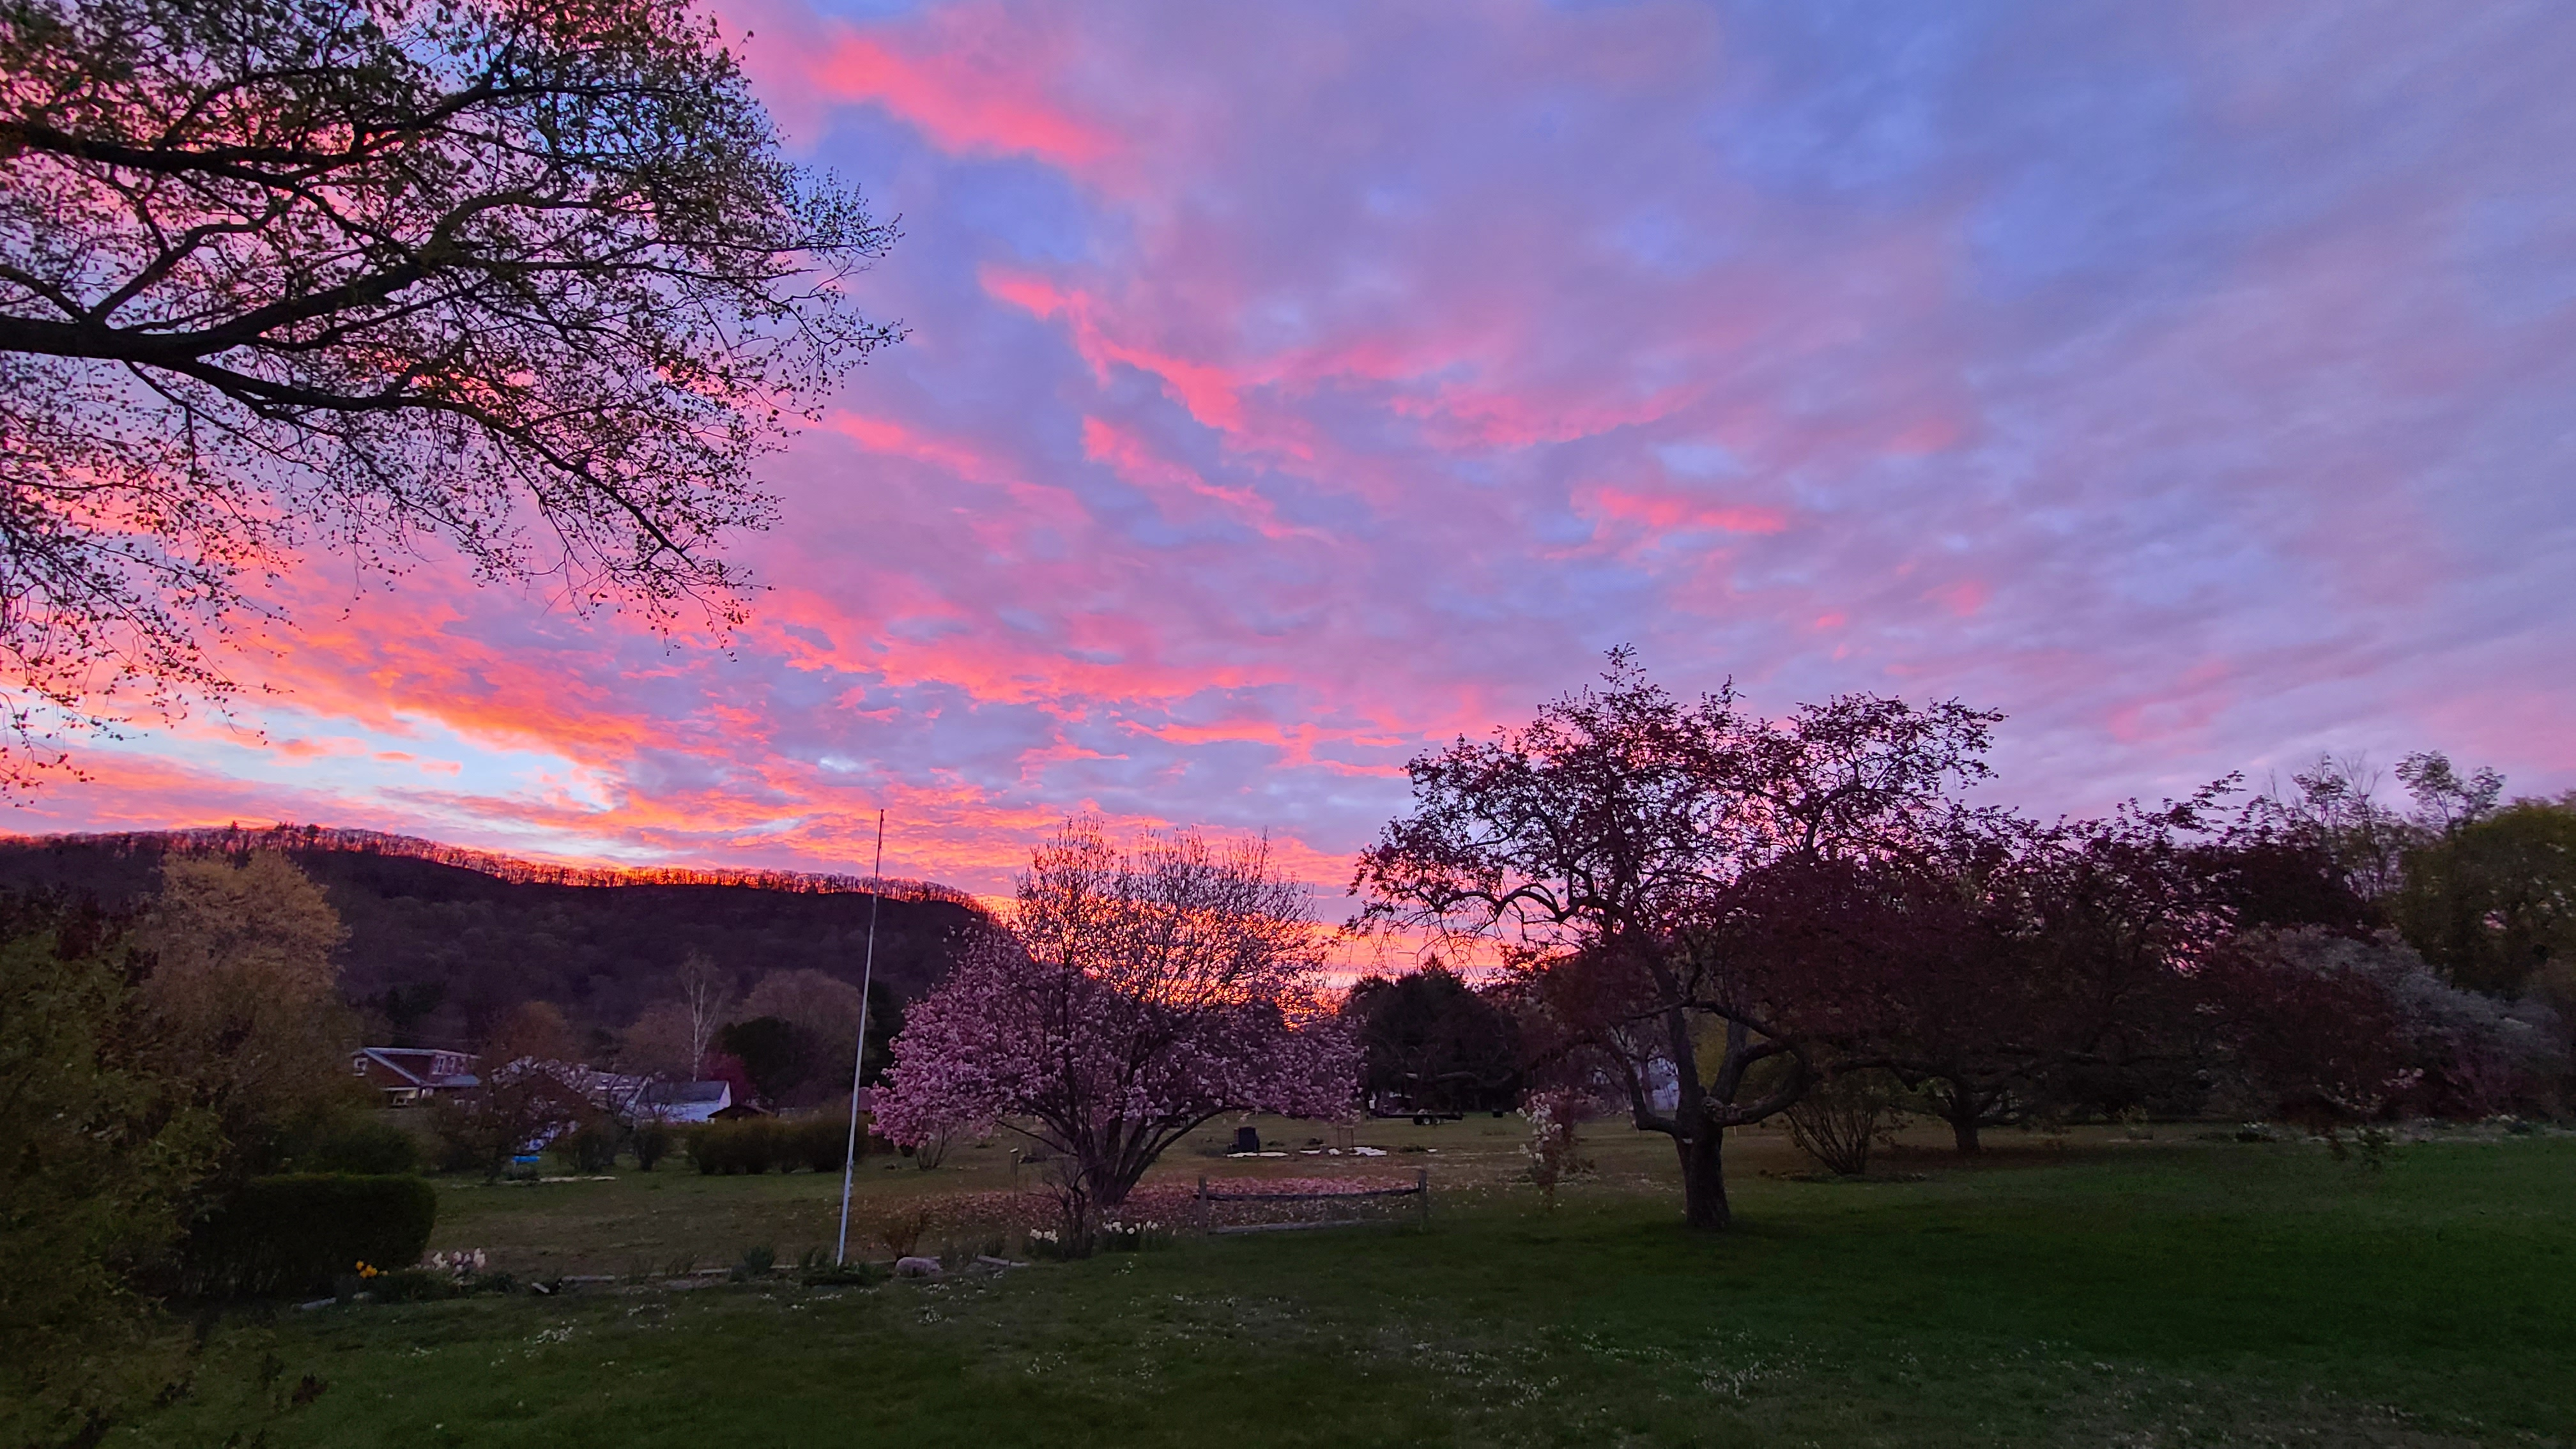 Sunrise in South Deerfield